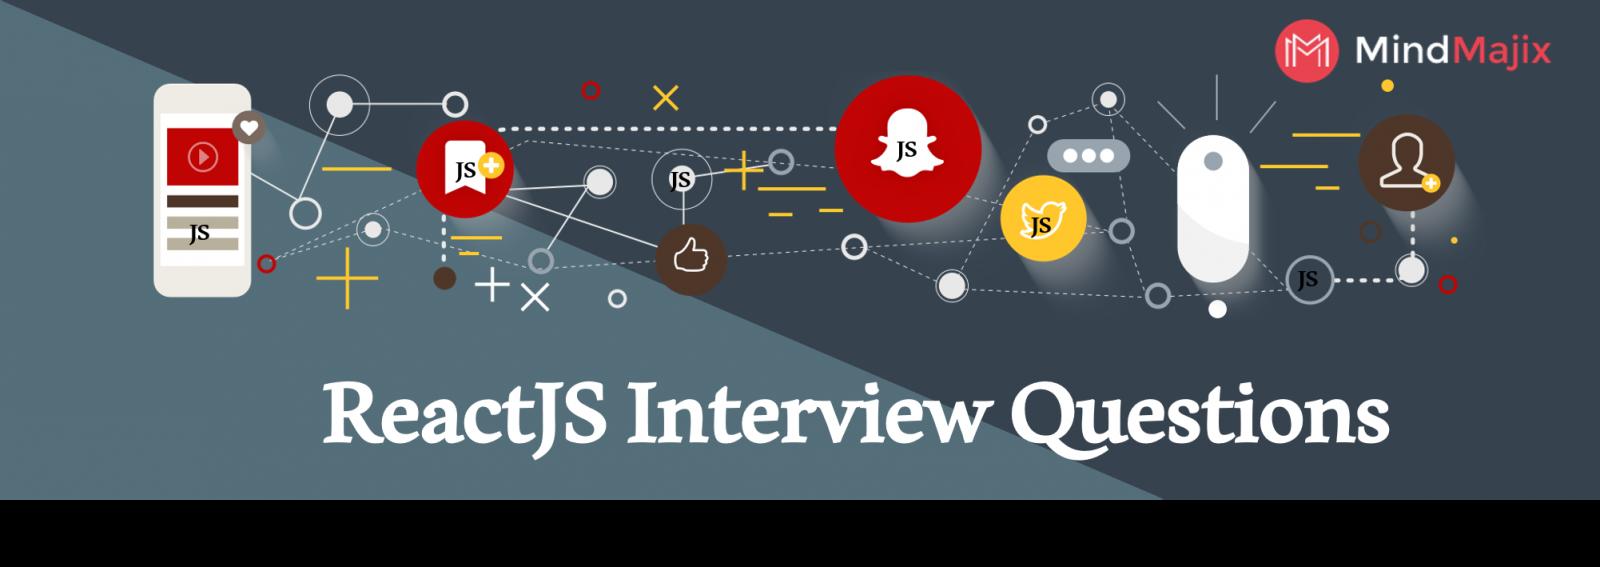 ReactJS Interview Questions | education | Interview questions